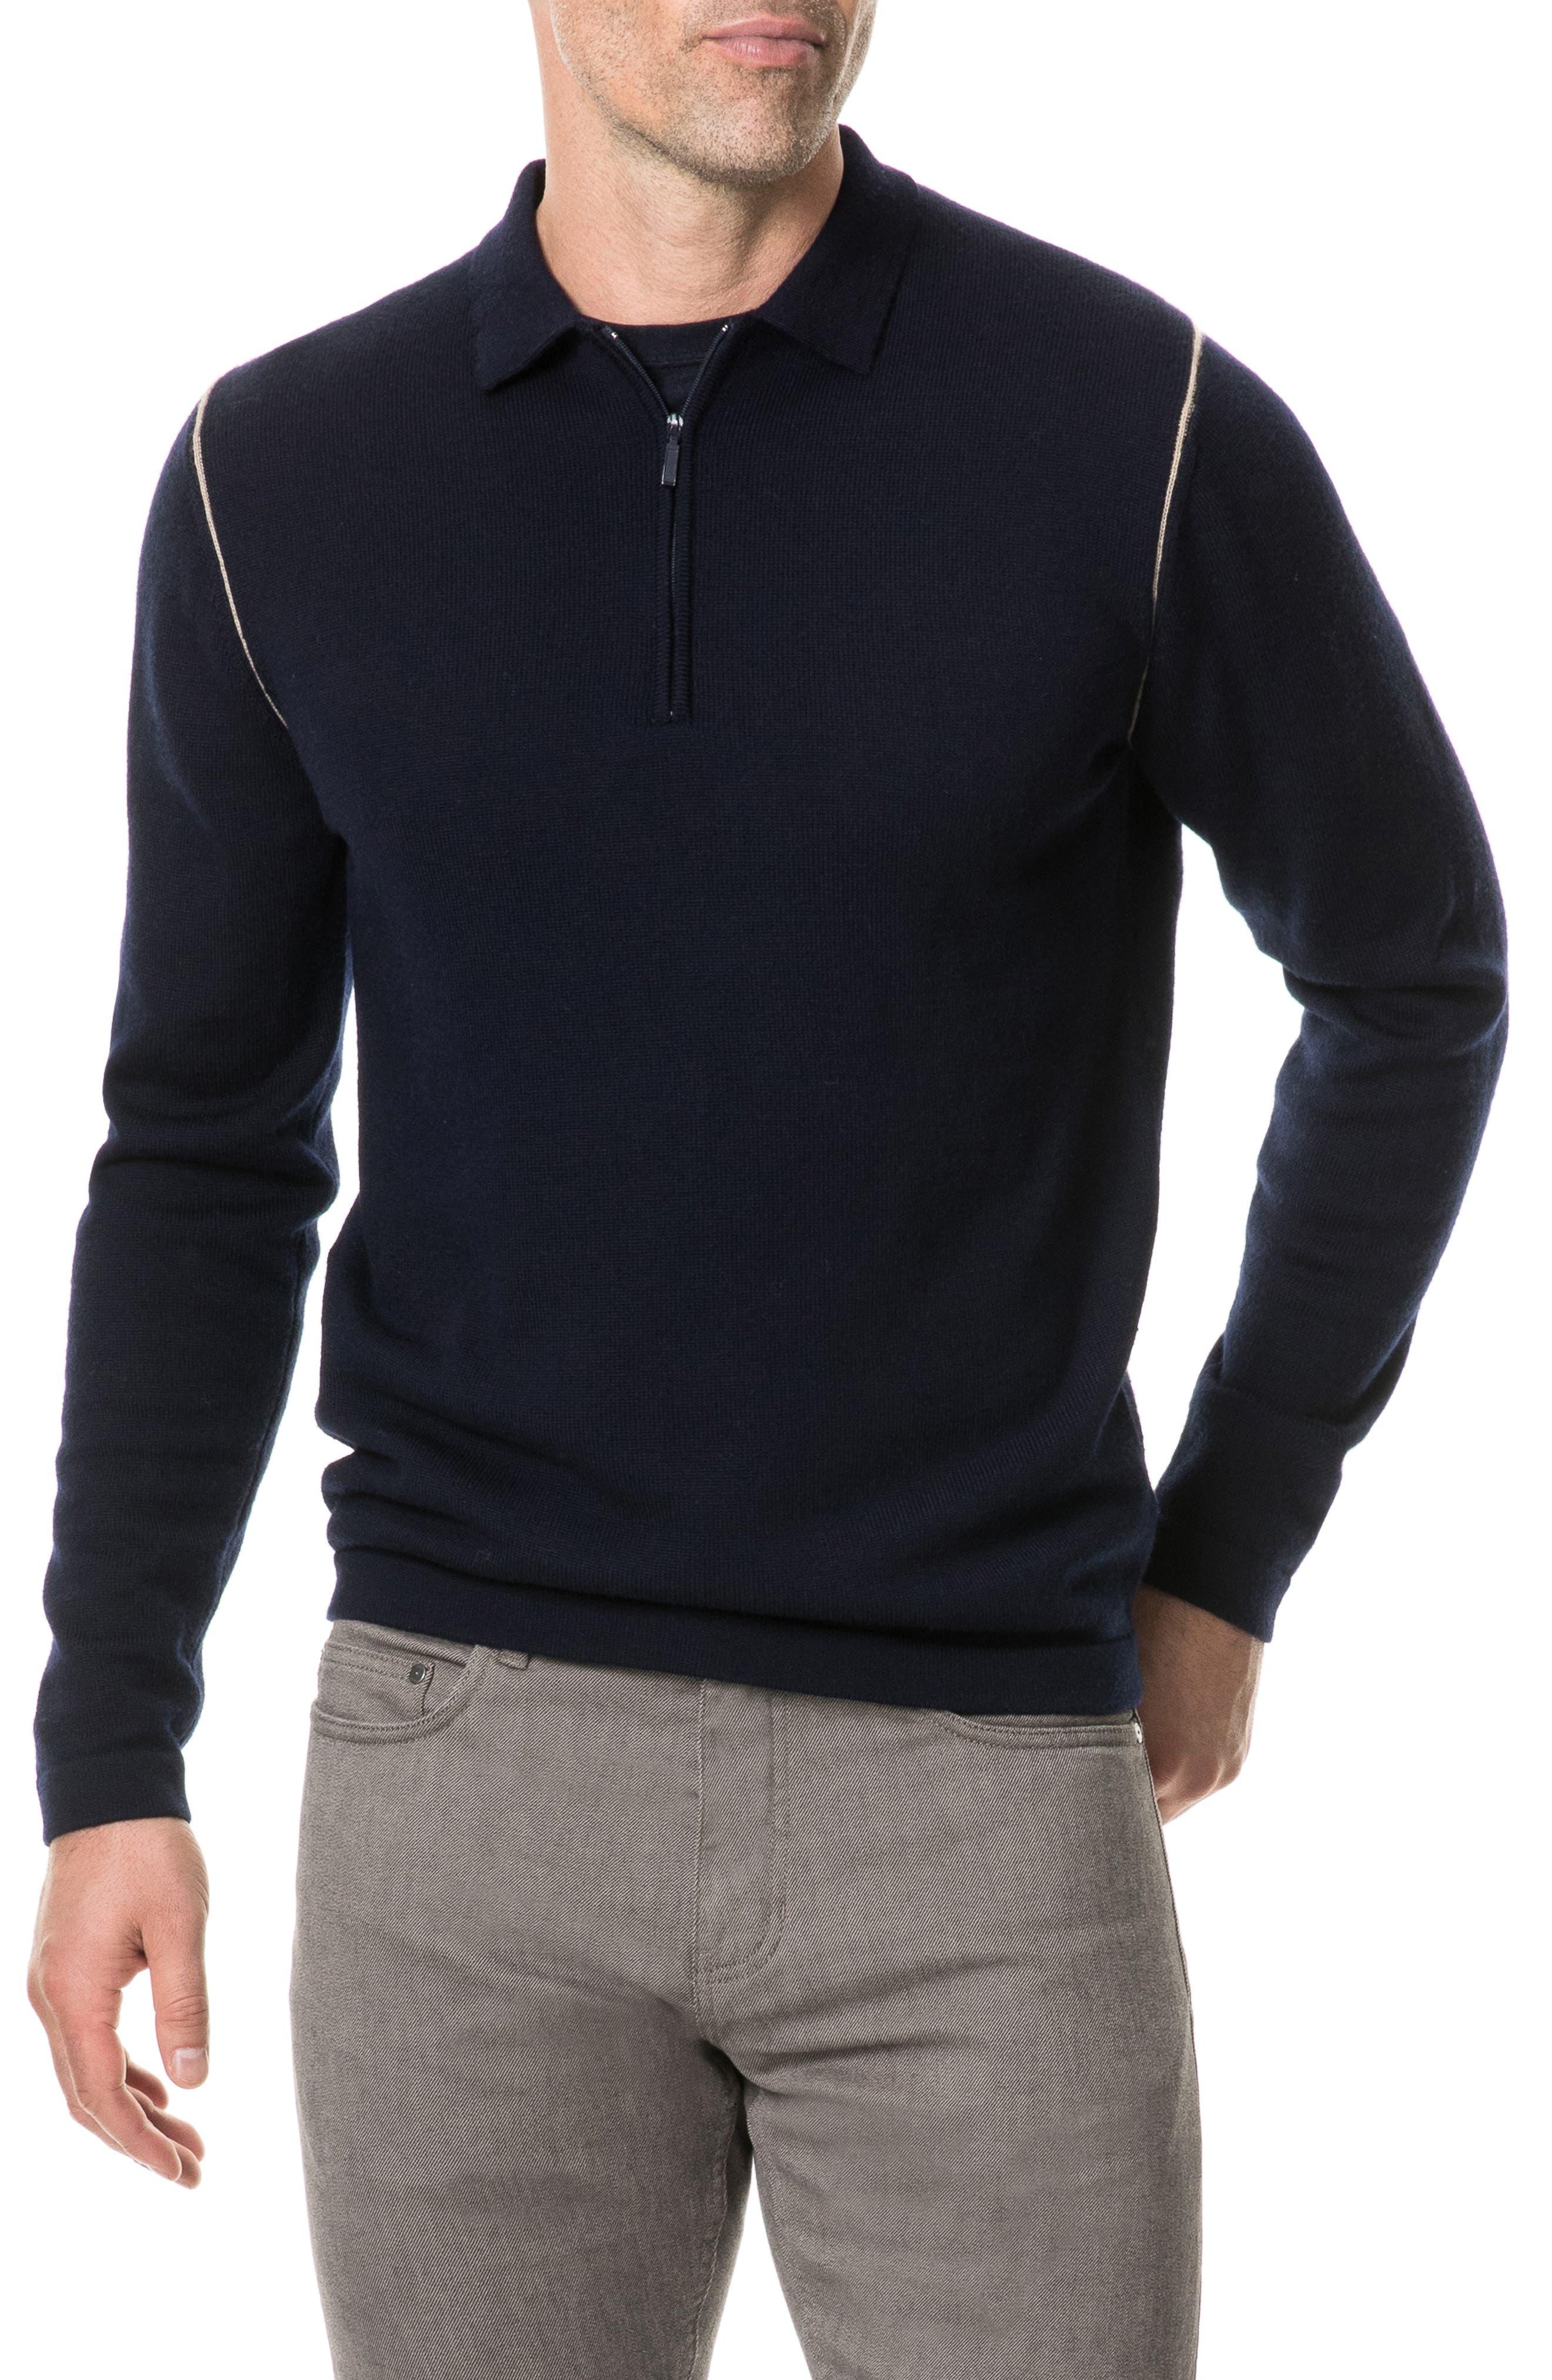 Revill Reserve Merino Wool Zip Polo,                         Main,                         color, MARINE